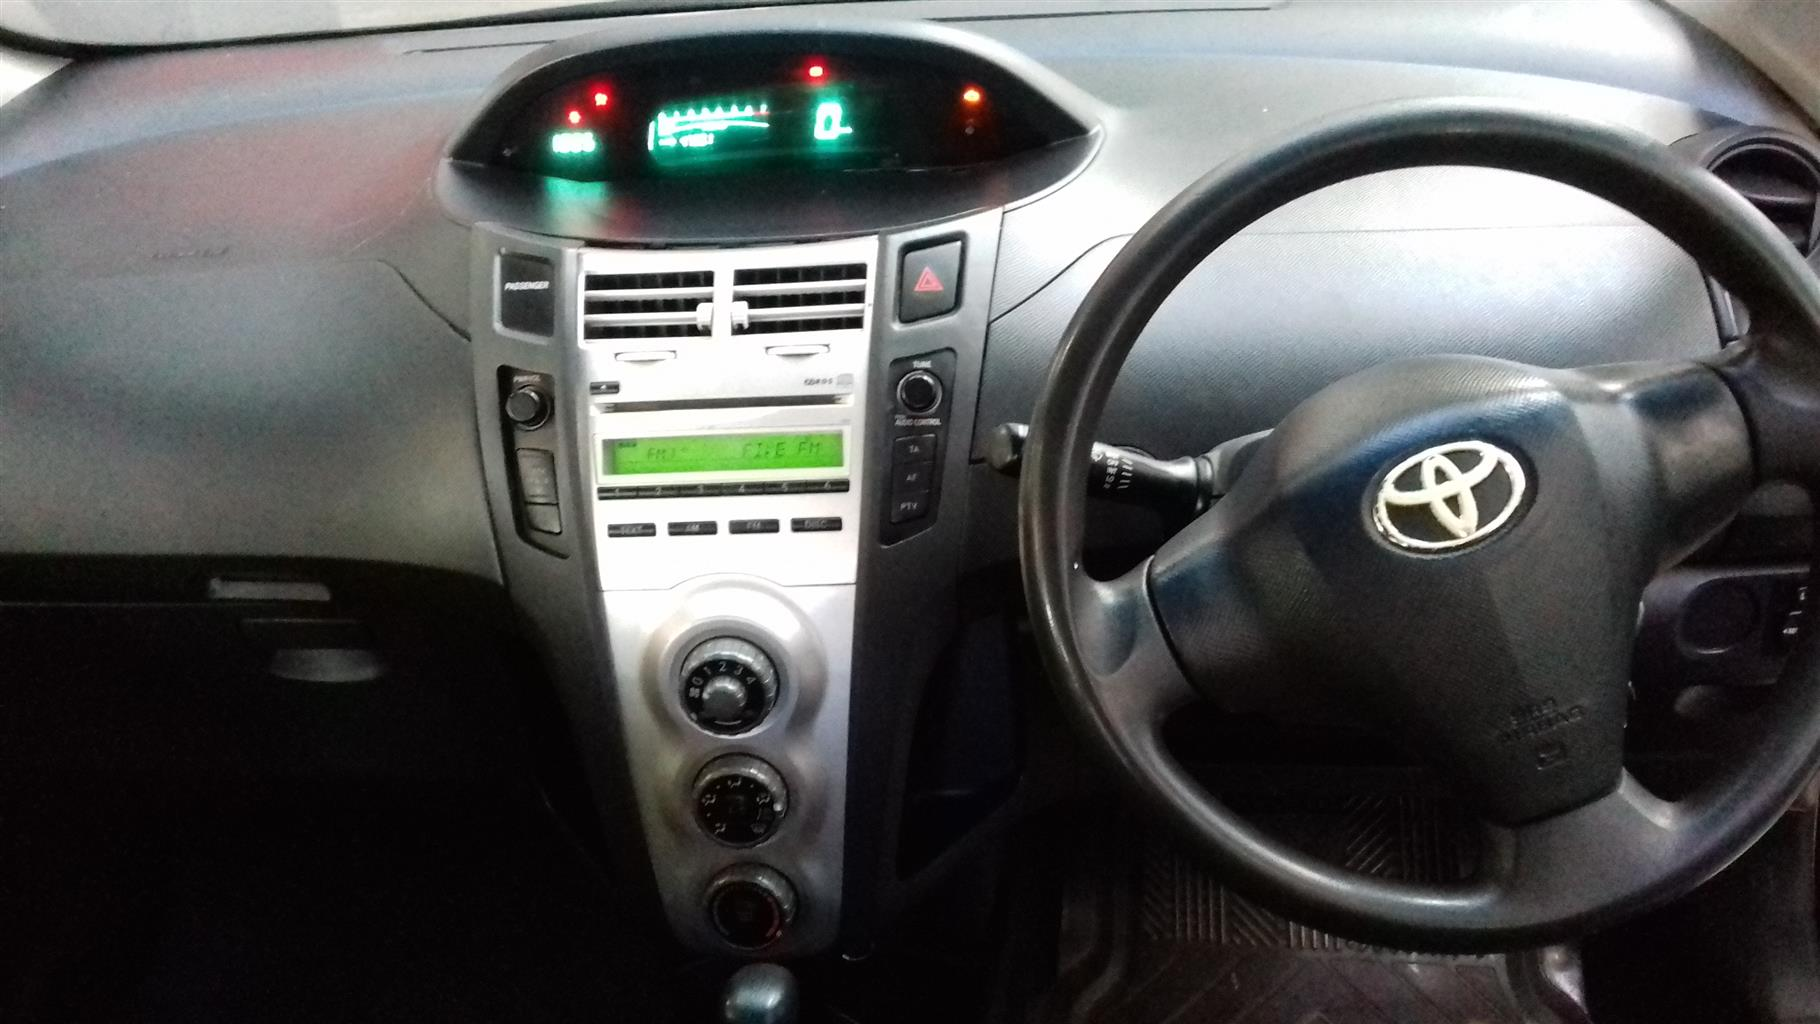 2007 Toyota Yaris 1.3 5 door T3+ automatic